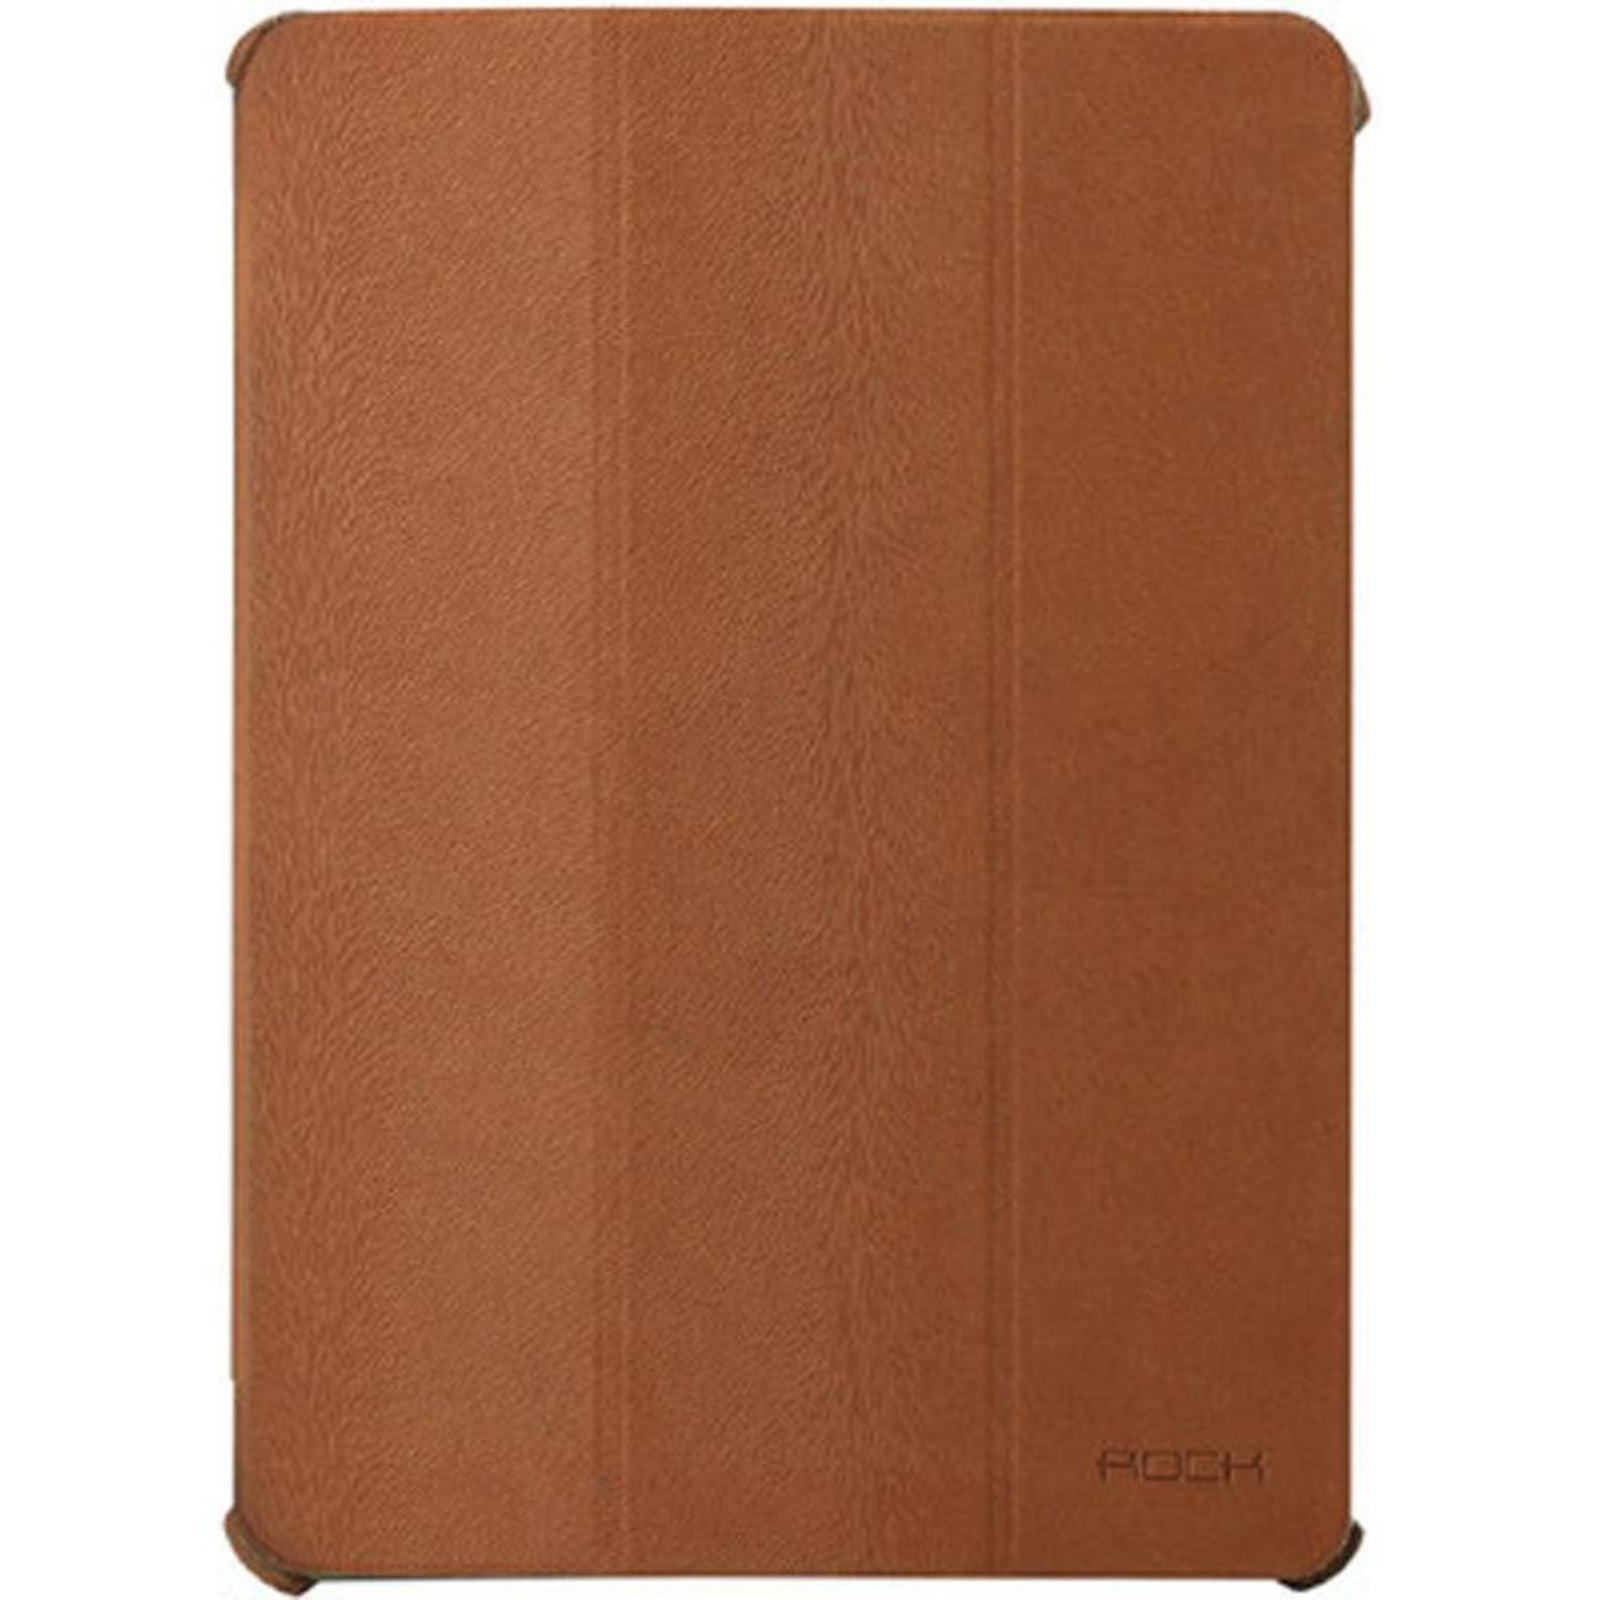 Чехол для планшета Rock texture series iPad Air coffee (iPad Air-57481)